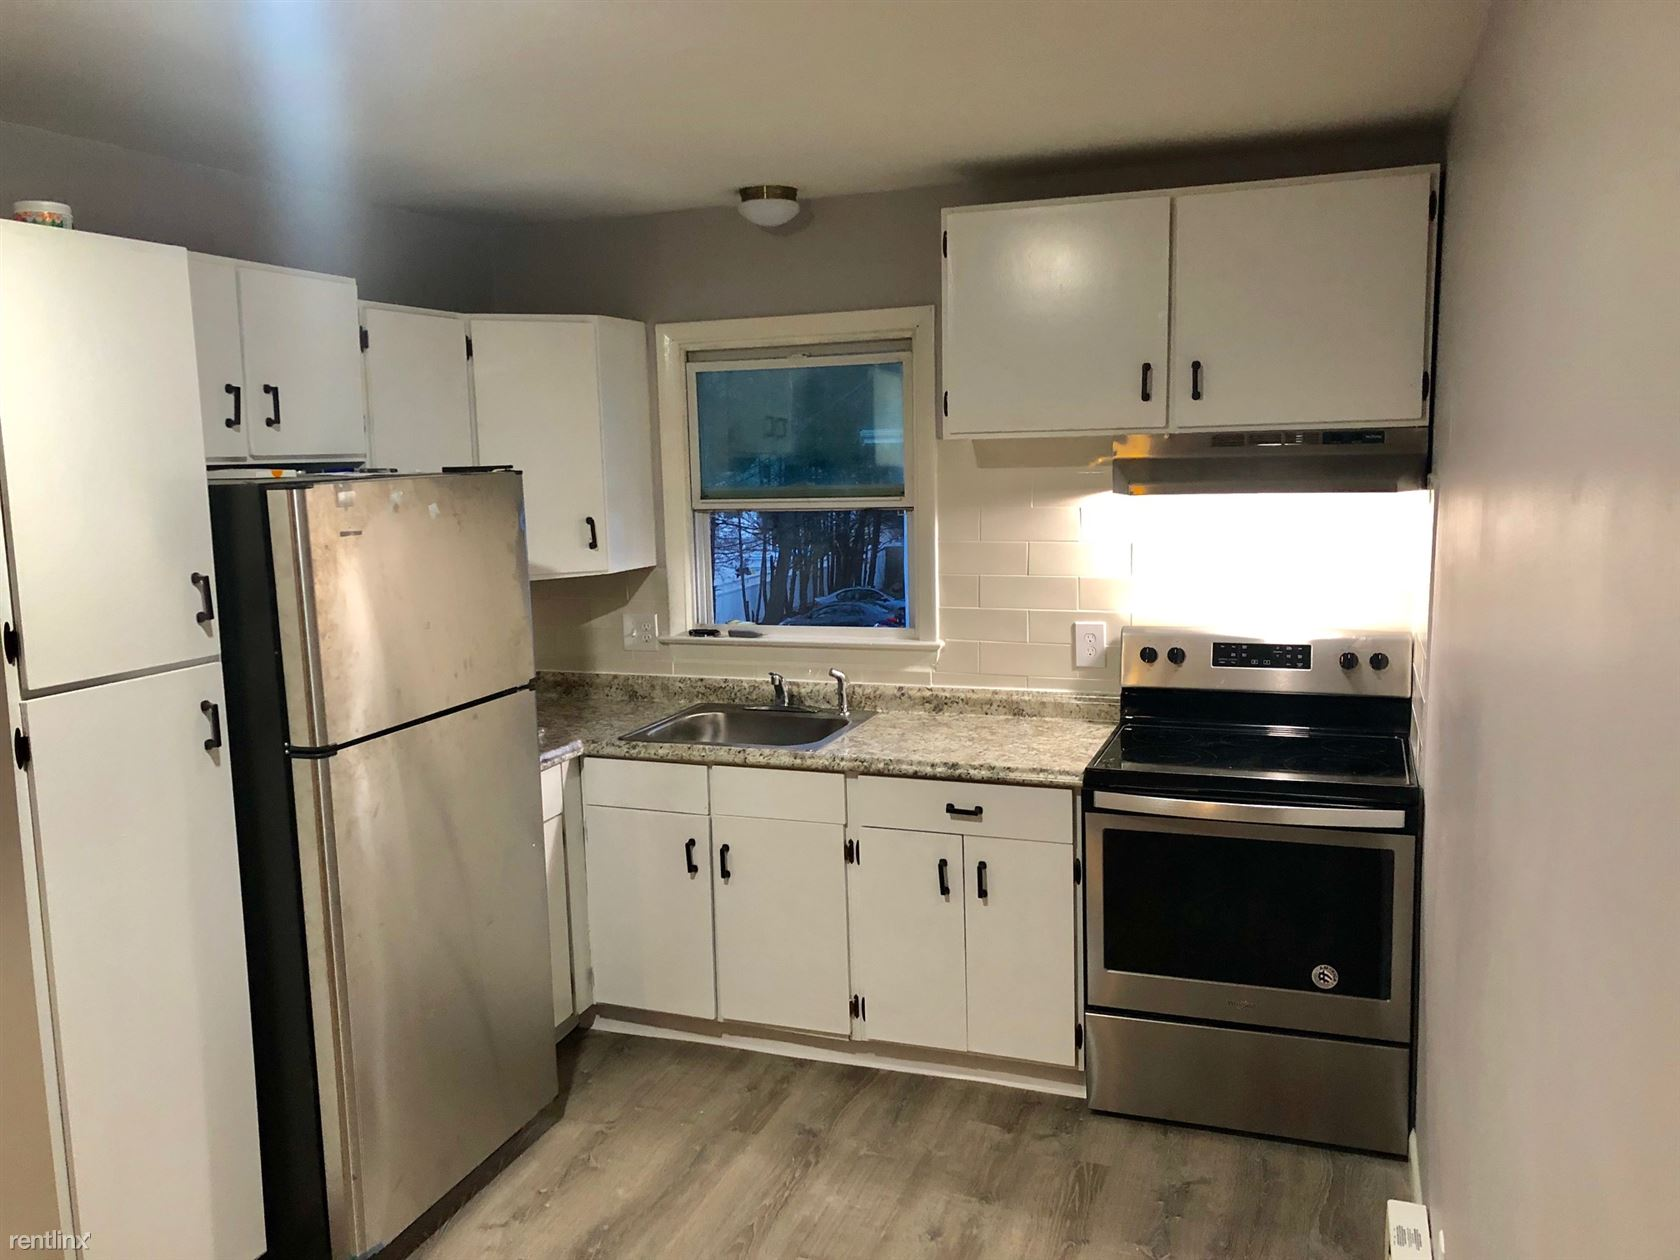 Duplex for Rent in Waterbury